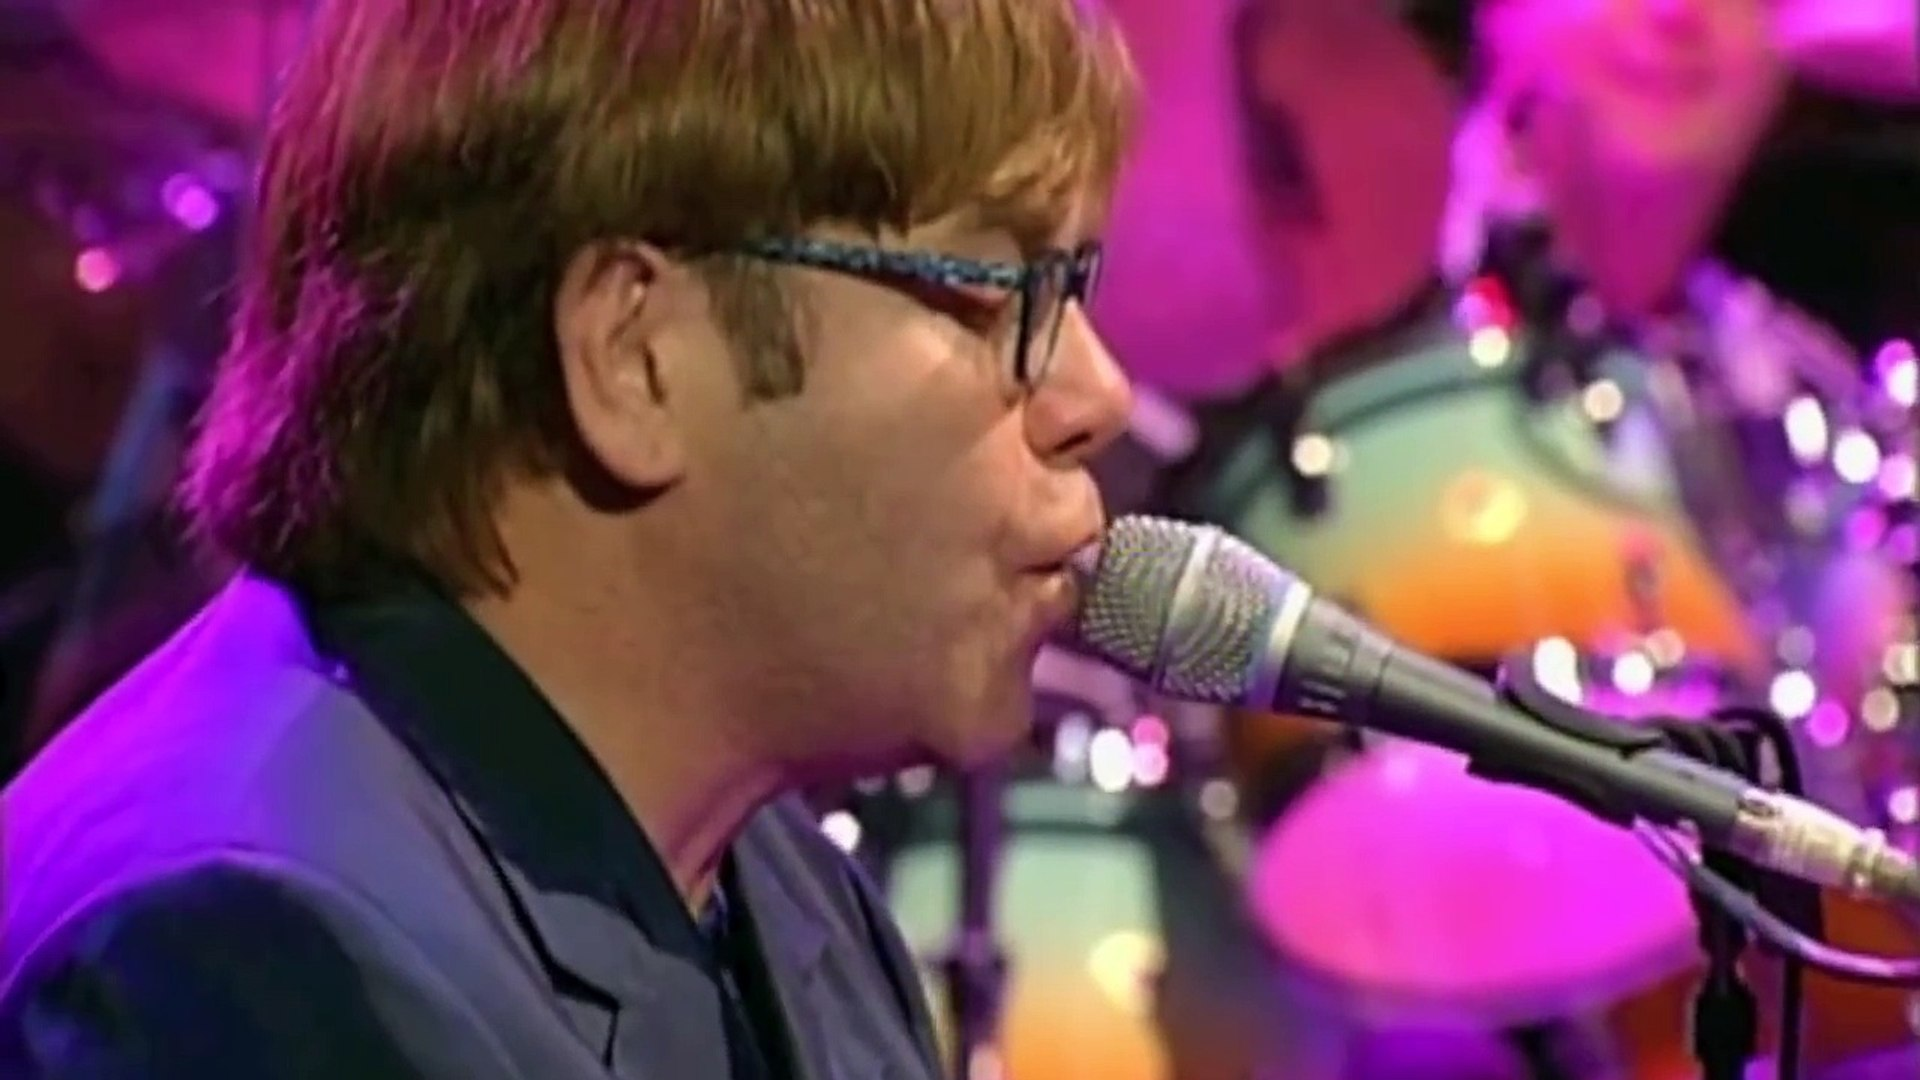 Hey Jude - Paul McCartney, Elton John, Eric Clapton, Sting, Phil Collins, Mark Knopfler, The Beatles